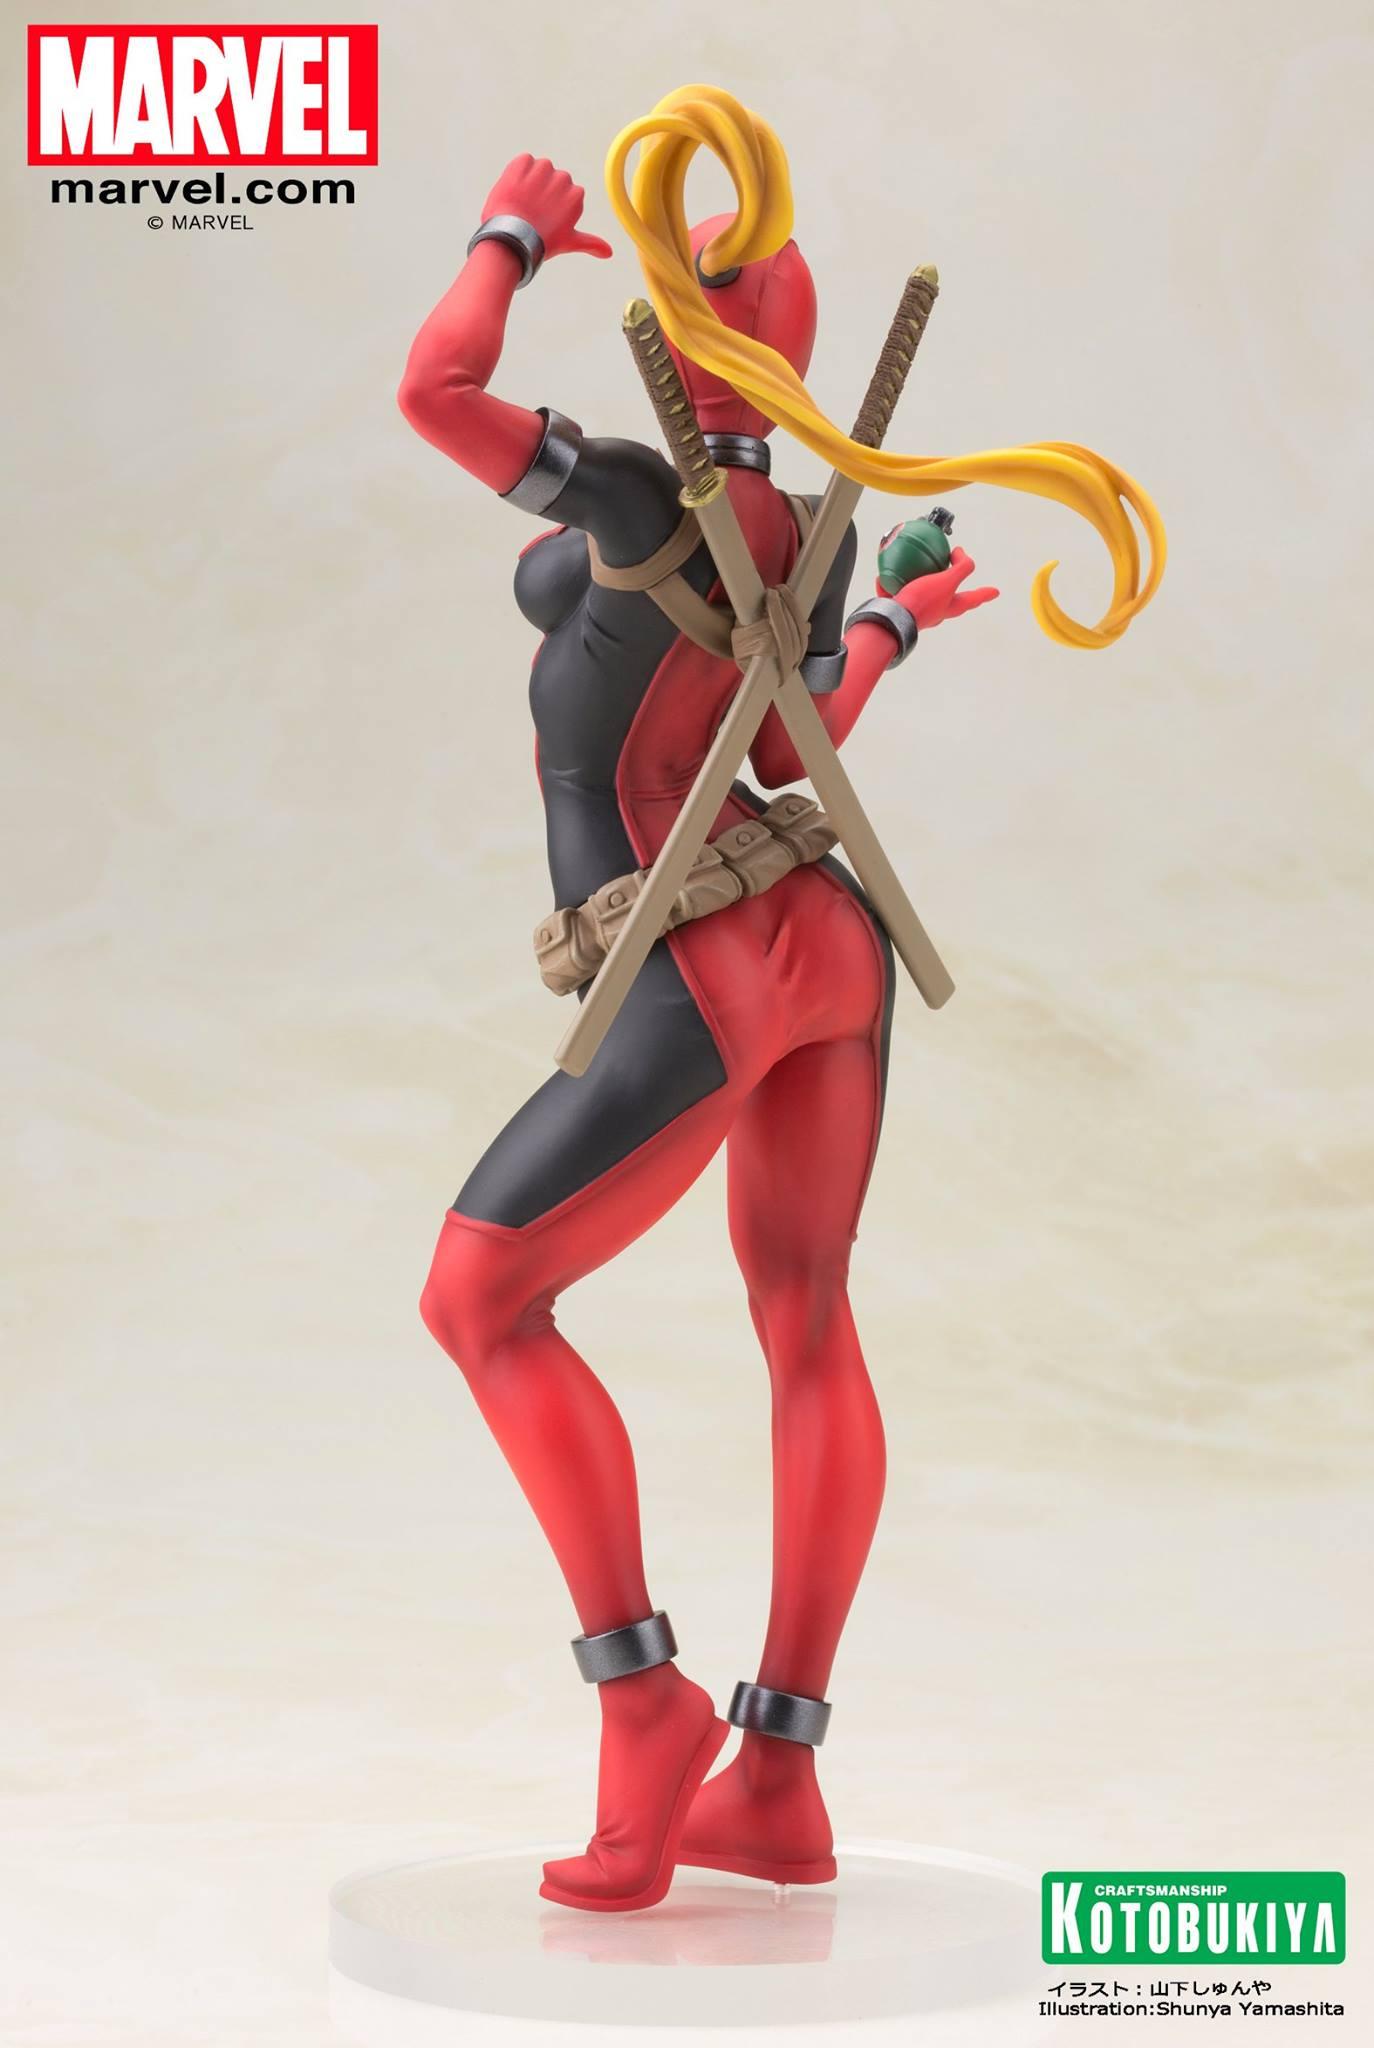 lady-deadpool-bishoujo-statue-marvel-kotobukiya-5